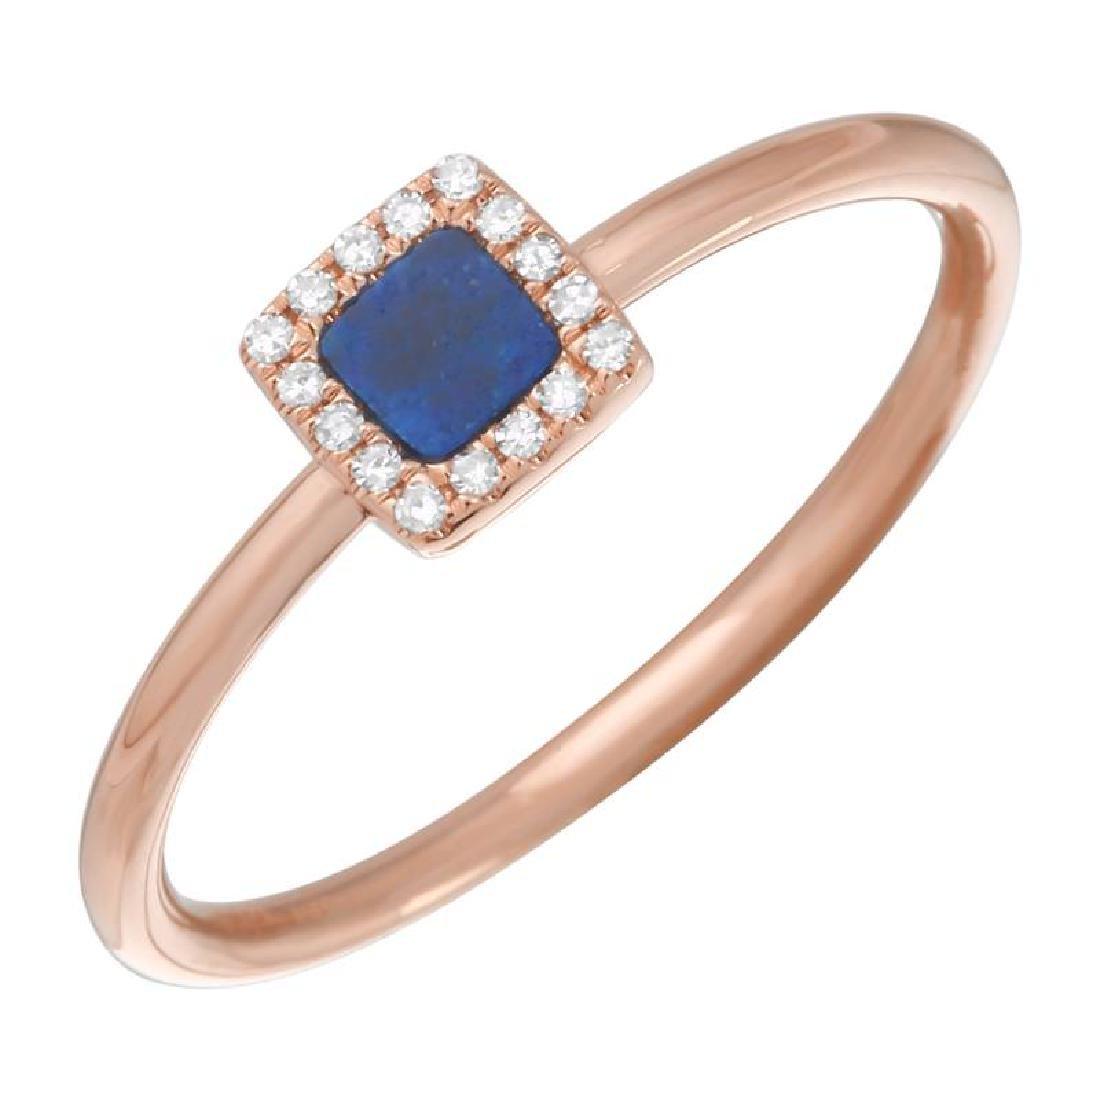 14KT Rose Gold Gemstone Ring